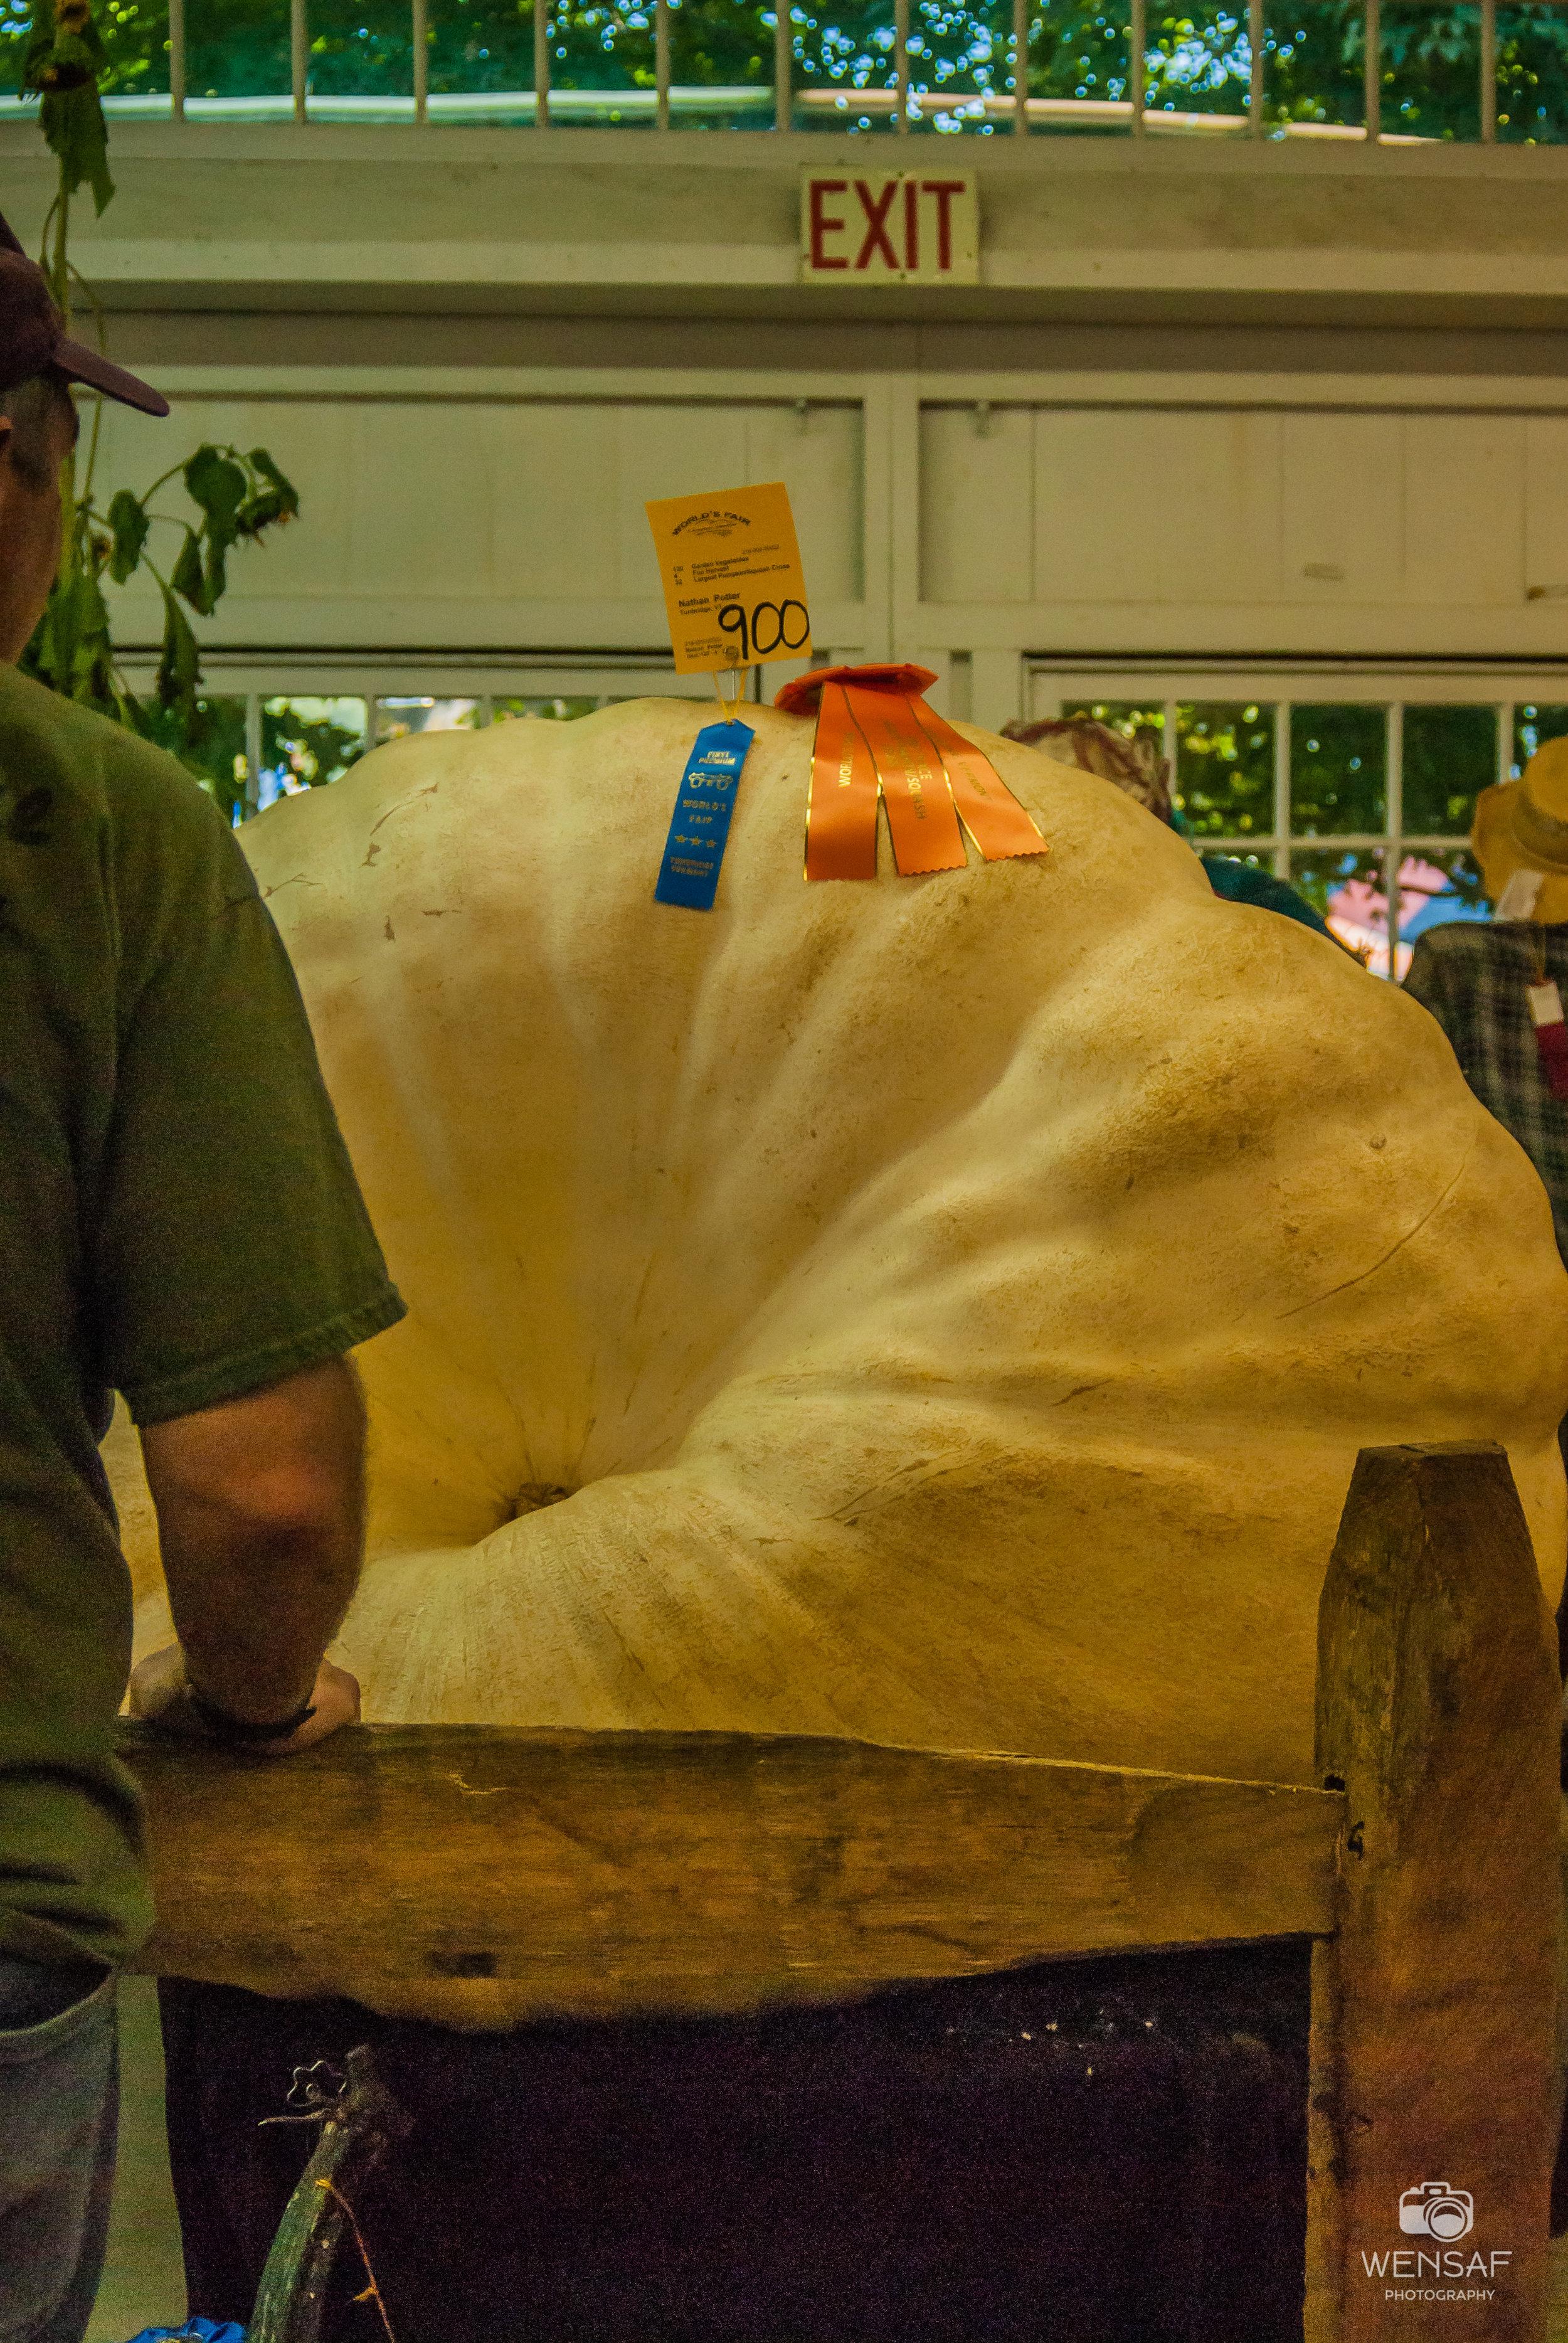 900 lb pumpkin amazed me….but not my kids LOL